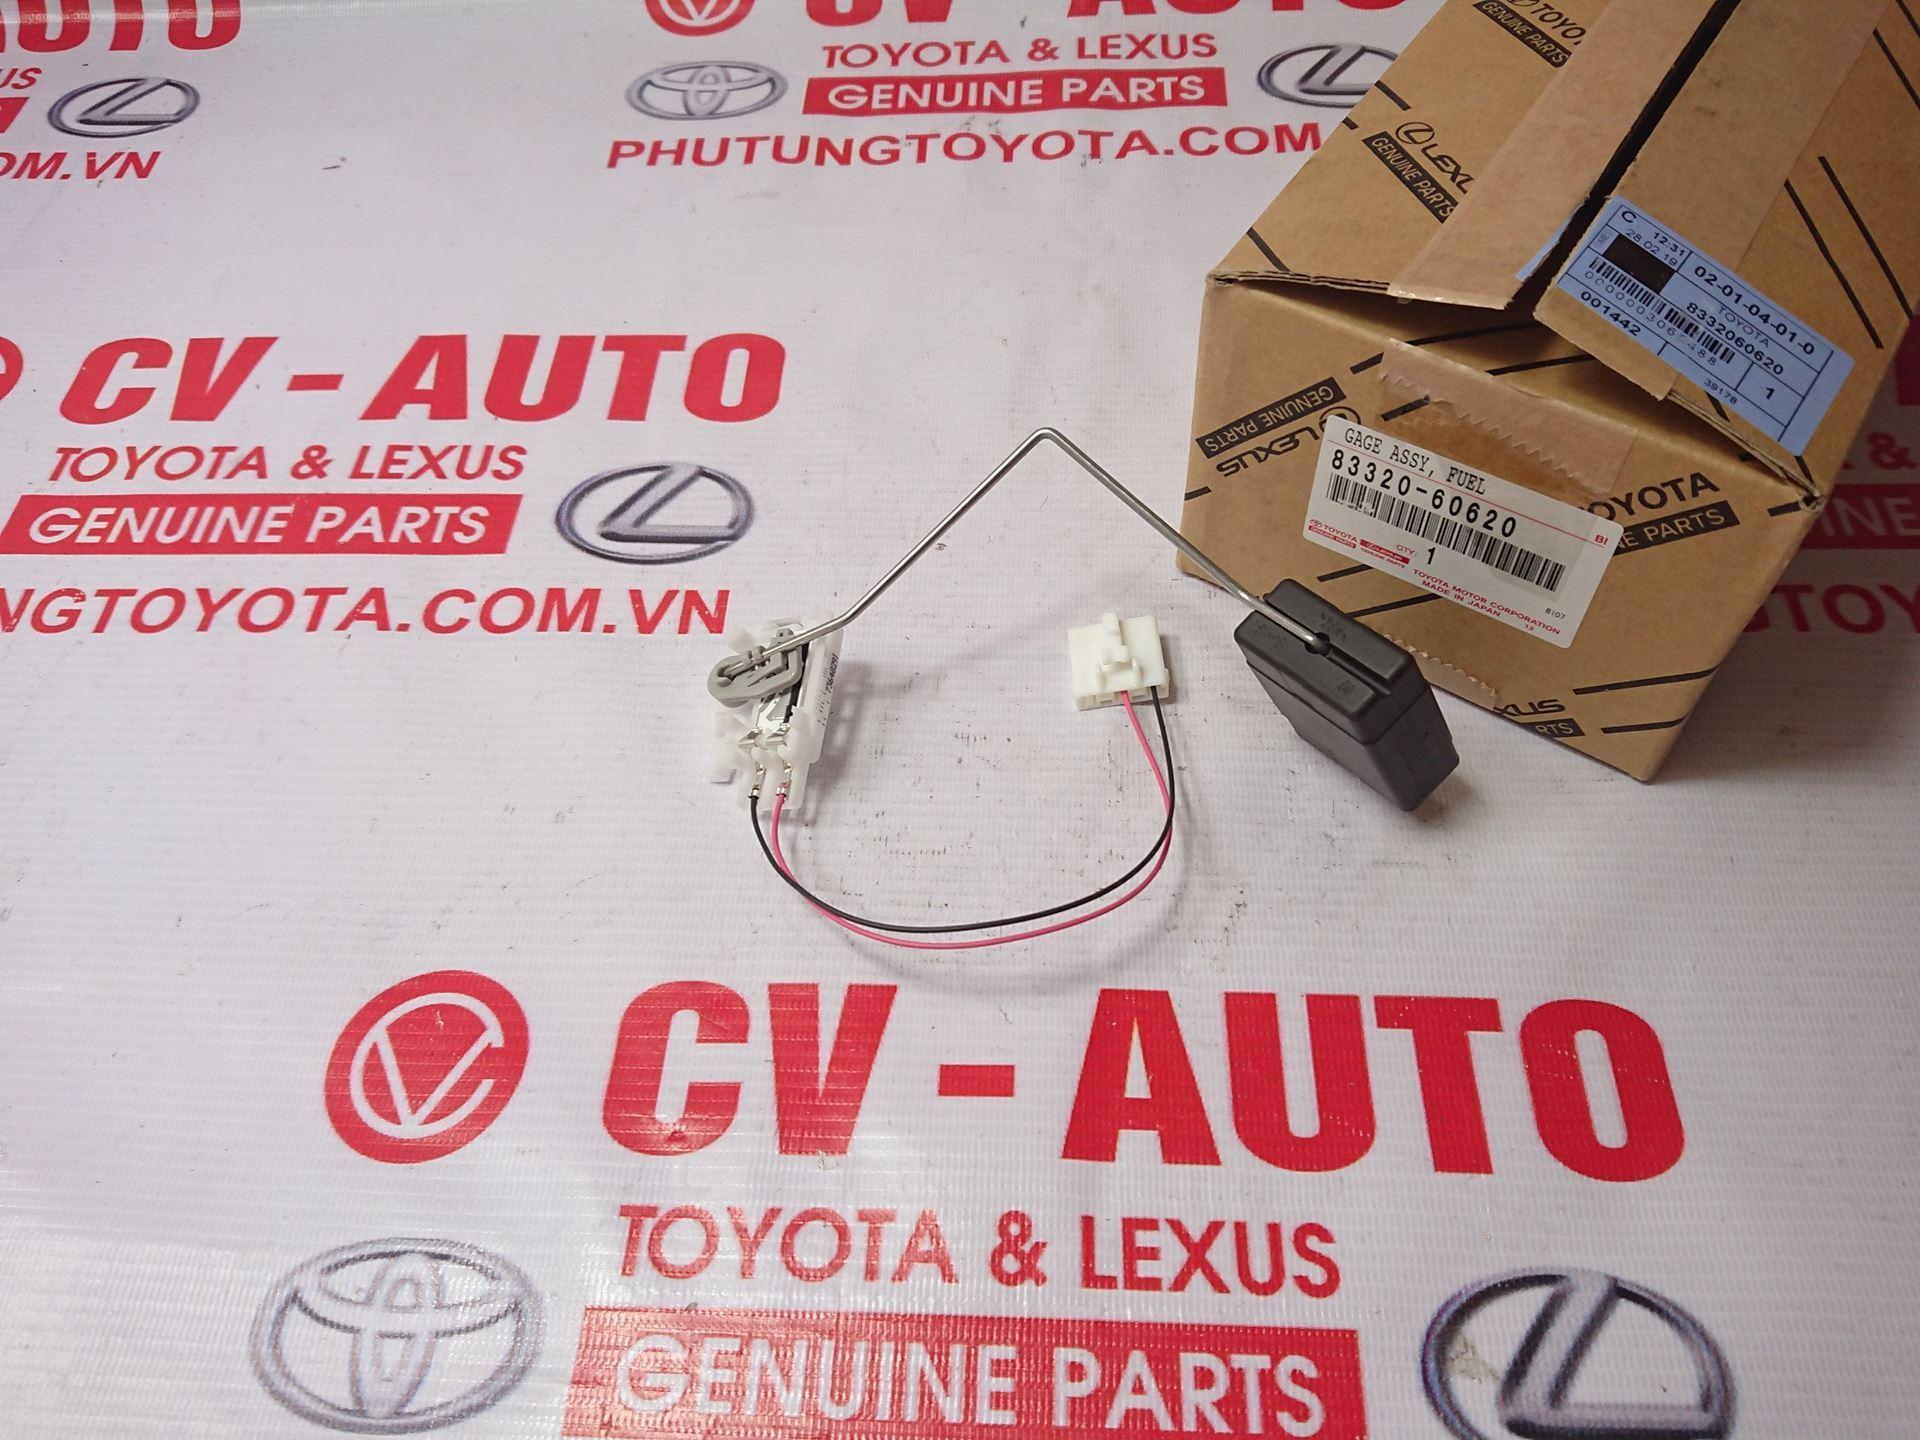 Picture of 83320-60620 Phao báo xăng Toyota Land Cruiser Prado, Fortuner, Innova